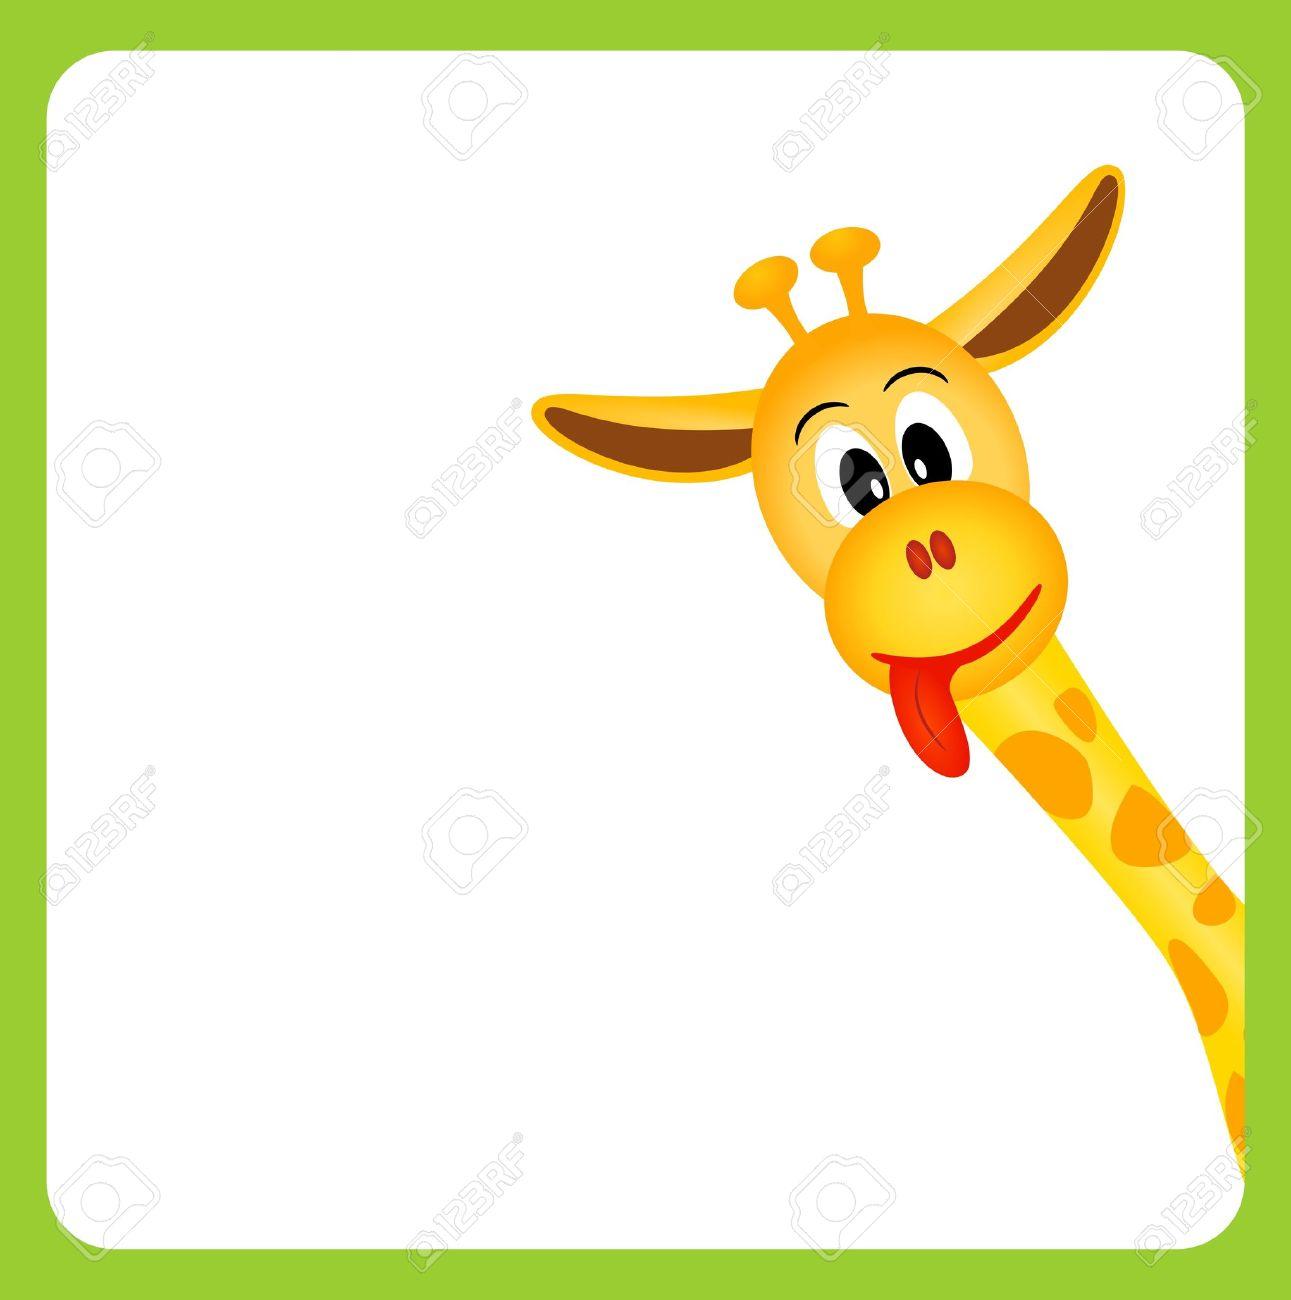 1291x1300 Long Tongue Giraffe Clipart, Explore Pictures